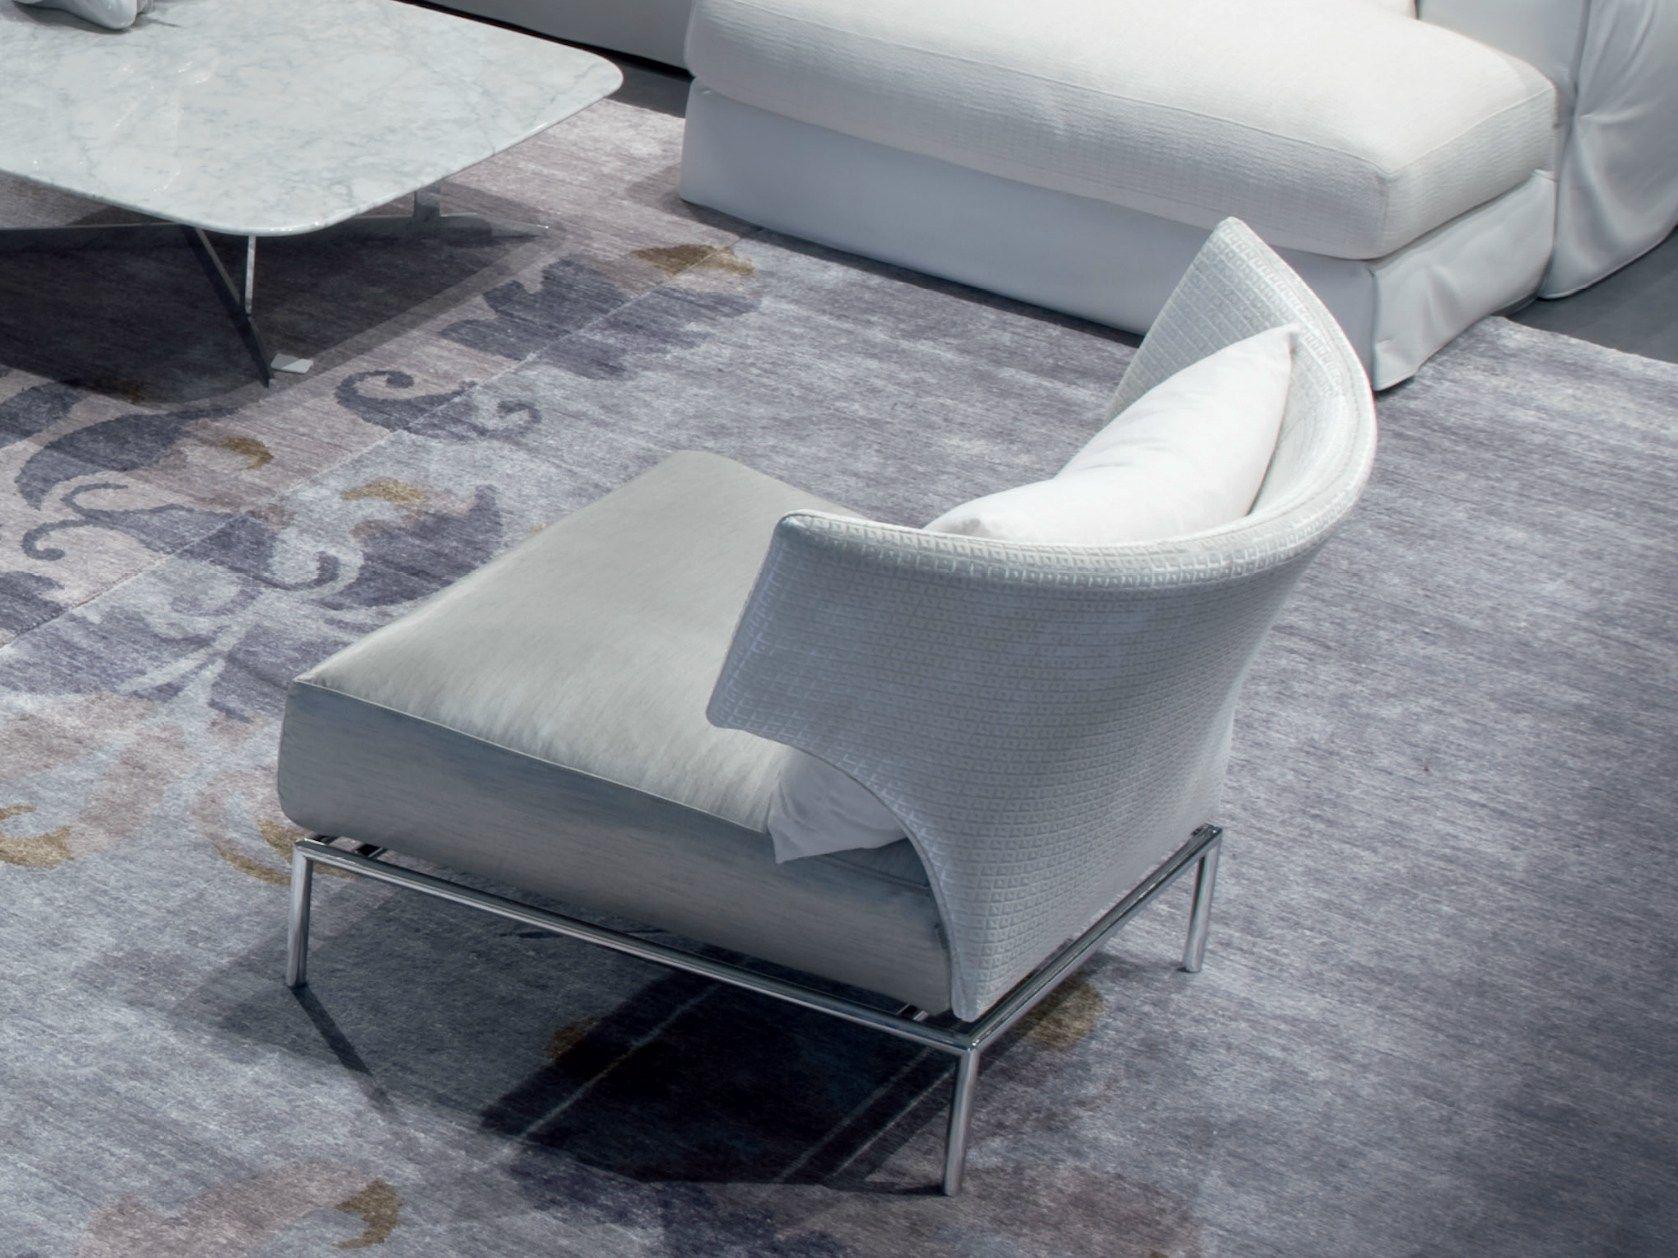 fauteuil oreilles rembourr abbraccio by erba italia. Black Bedroom Furniture Sets. Home Design Ideas